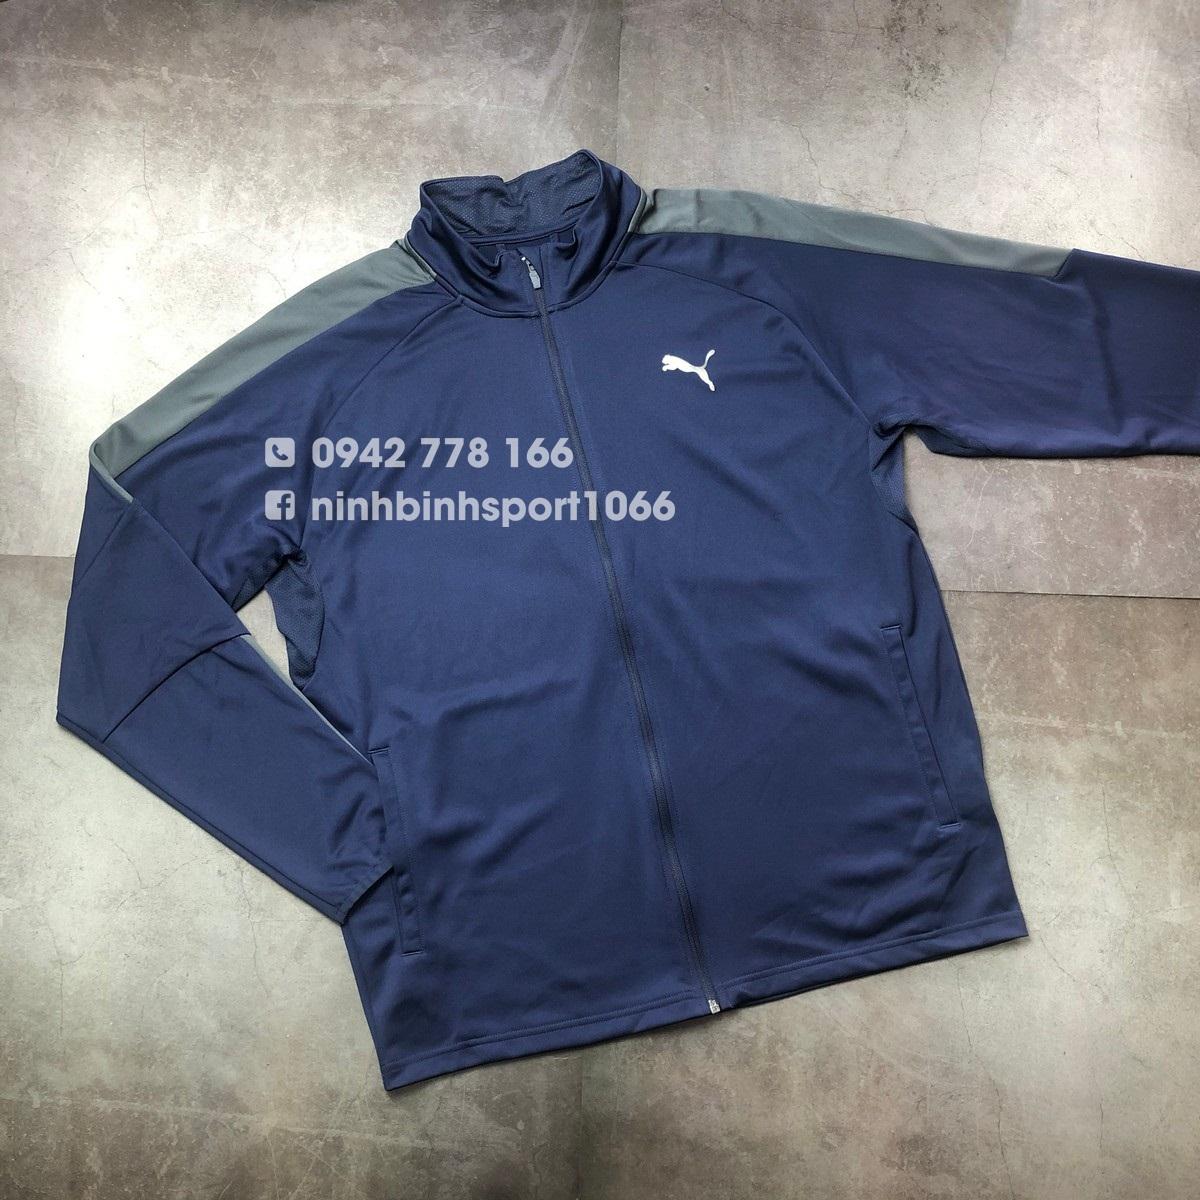 Áo khoác thể thao nam Puma Energy Training Jersey 517575-02